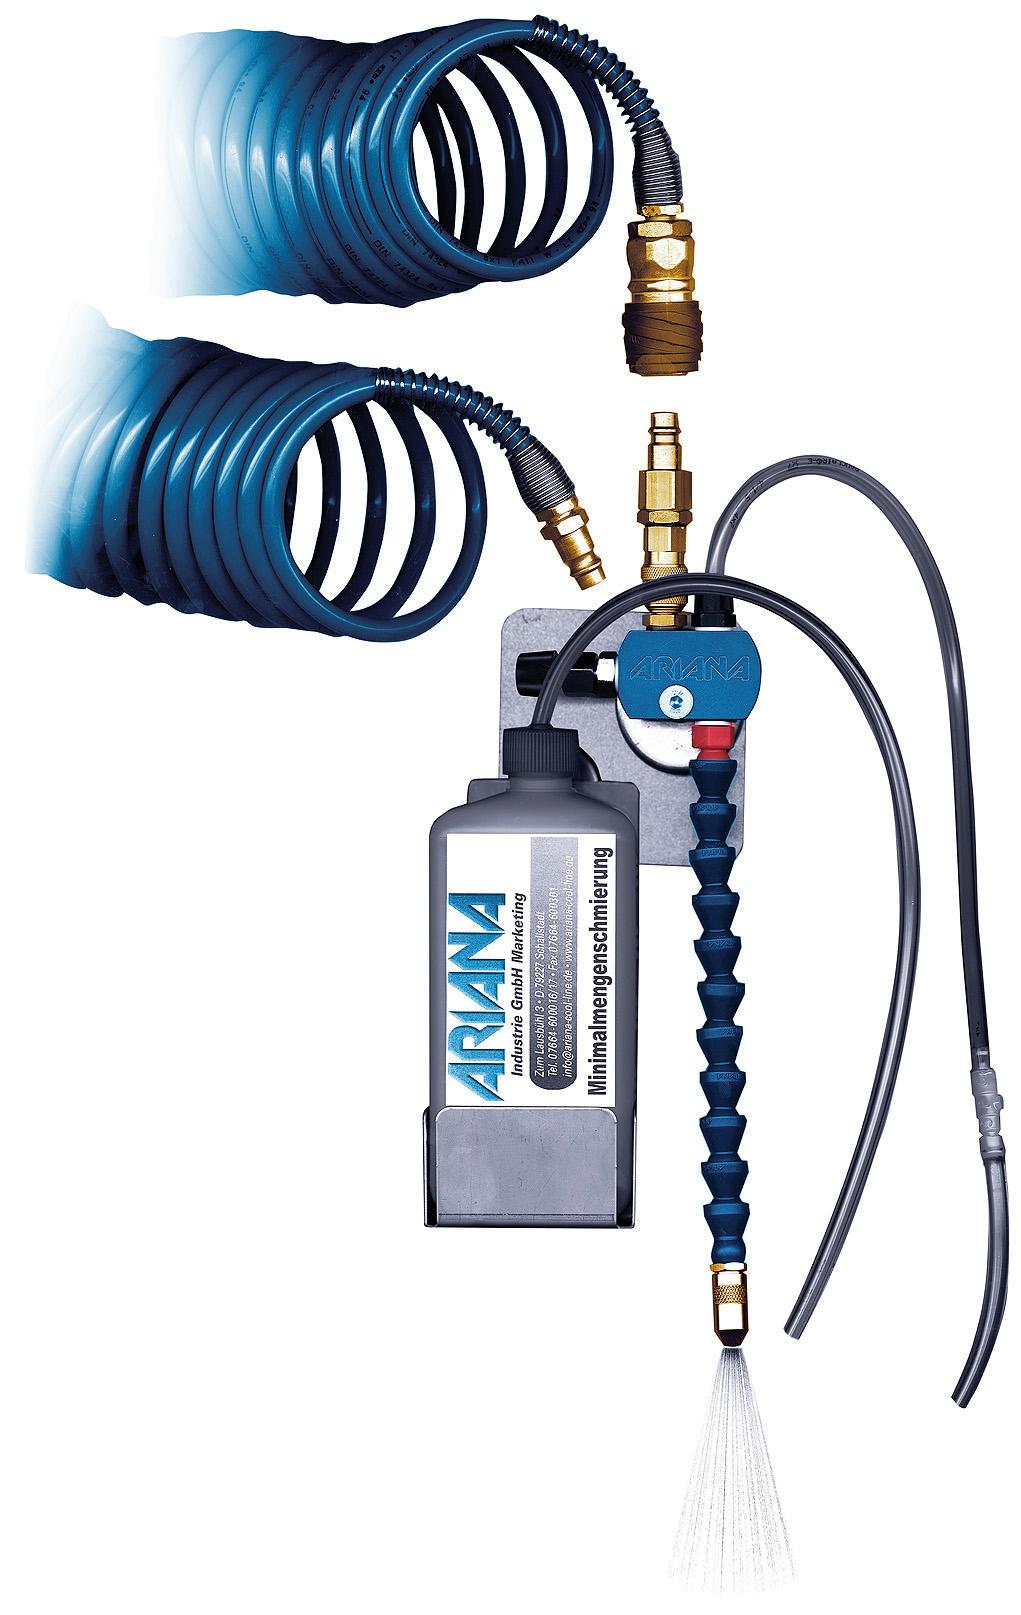 Minimum Gmbh micro system minimum quantity lubrication | buy online in the ariana